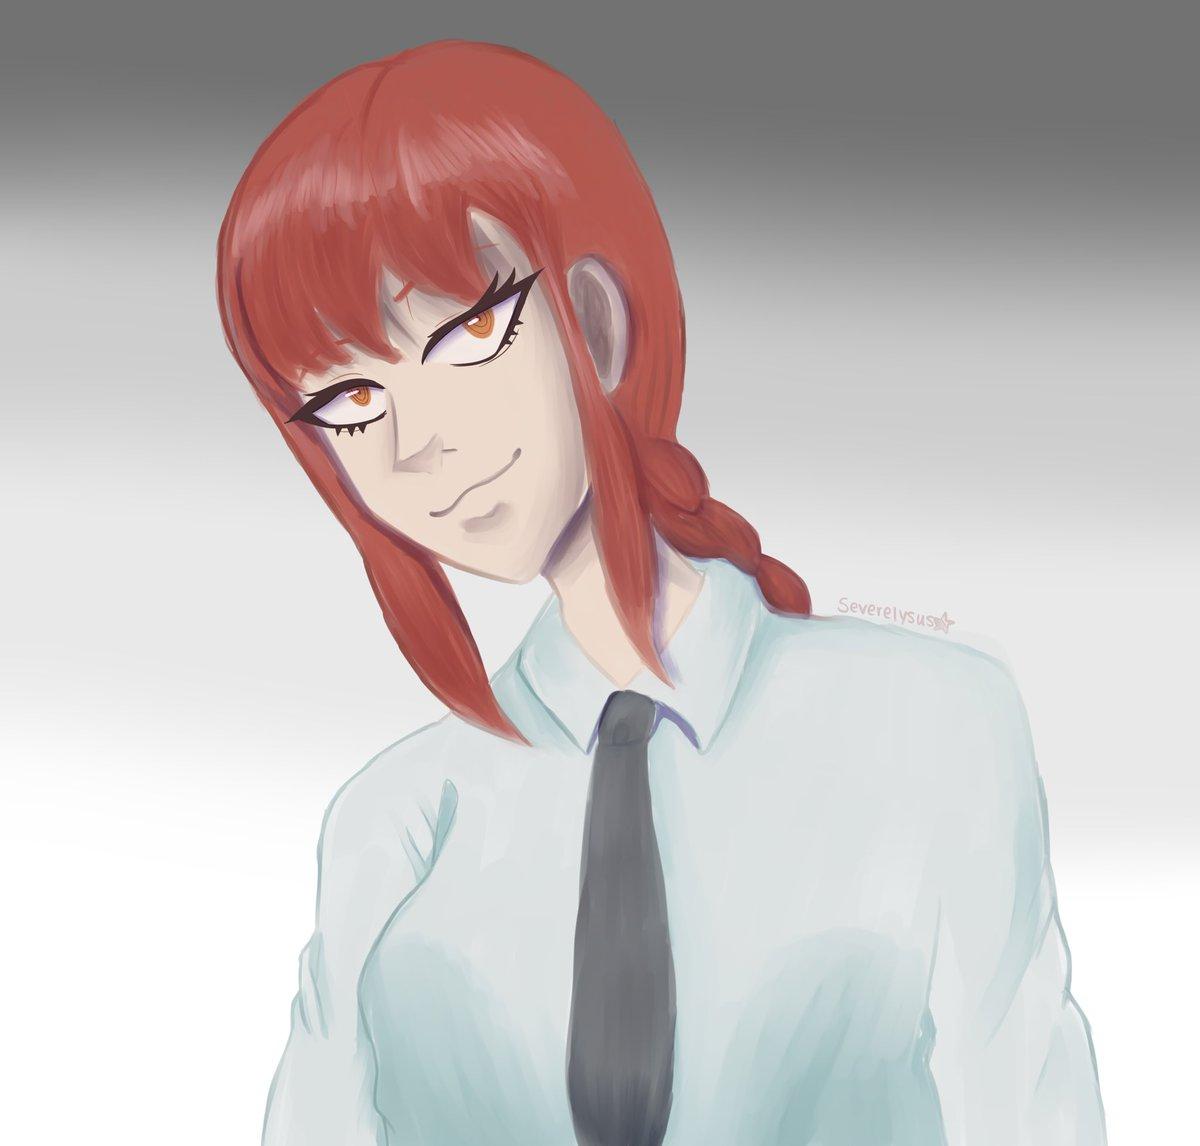 Red head lady #makima #chainsawman #chainsawmanfanart